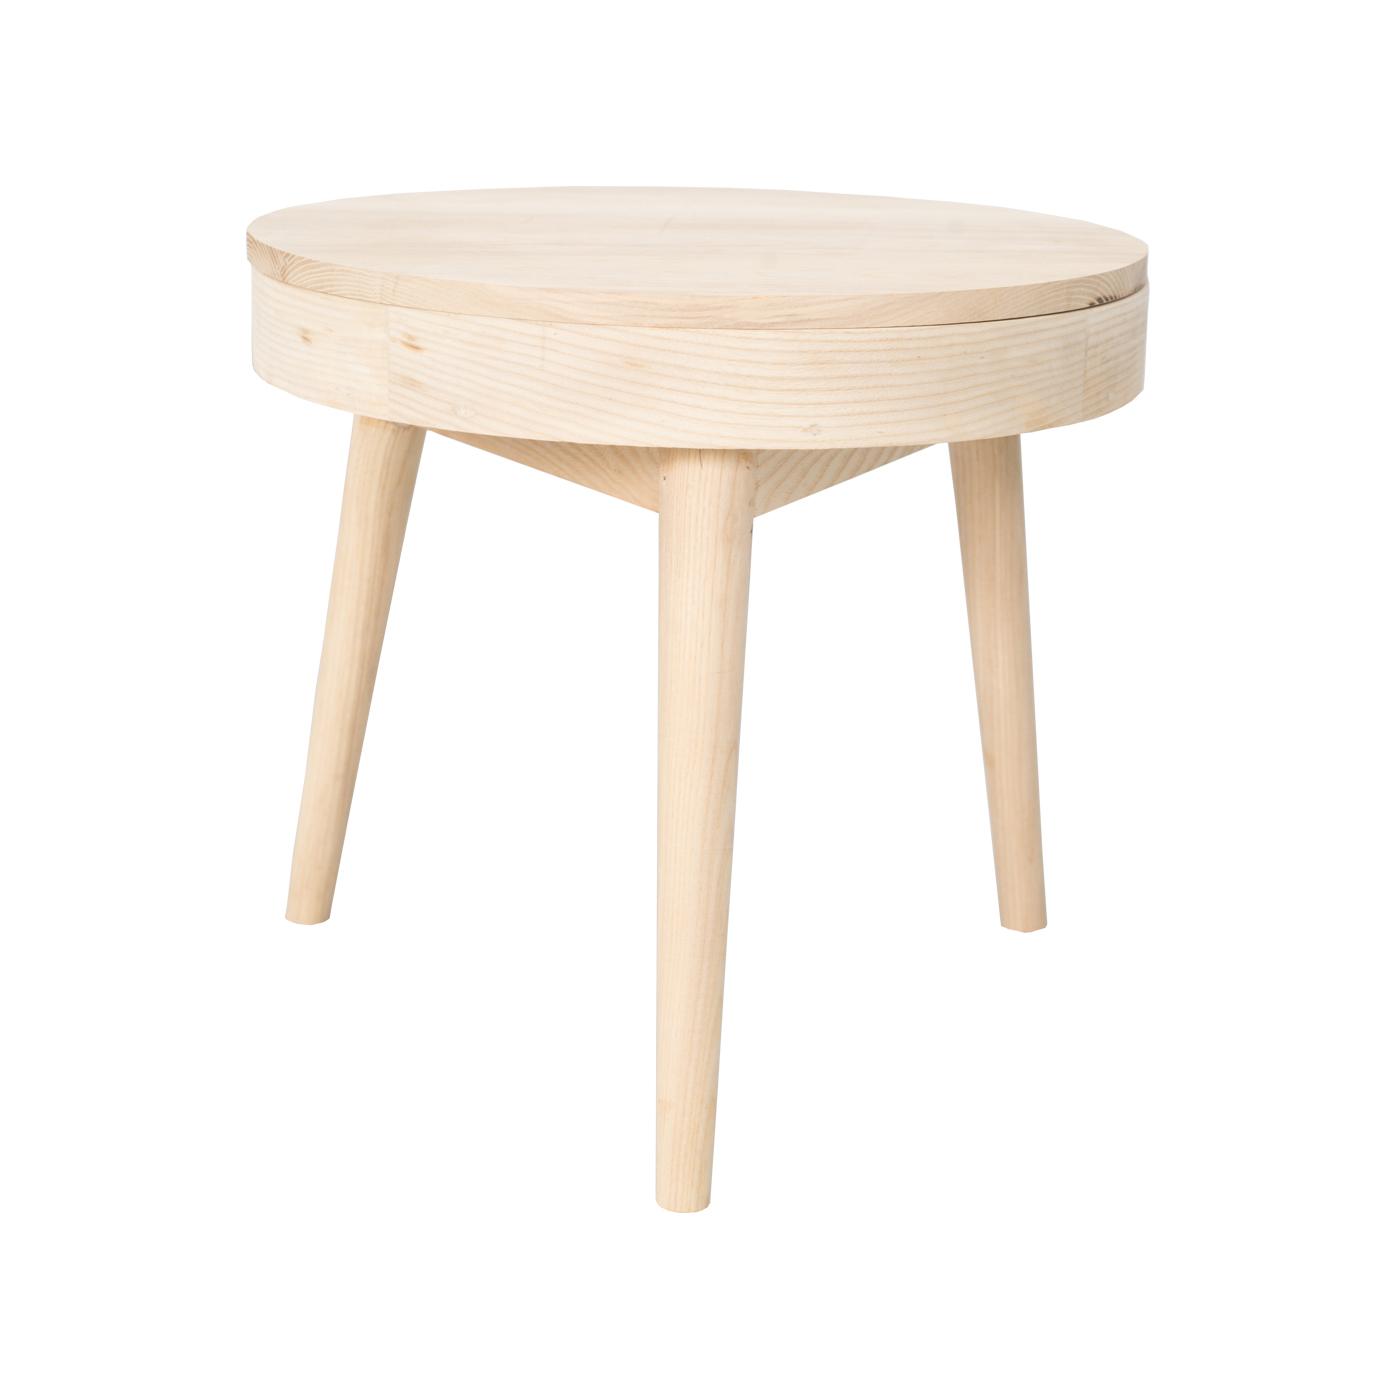 Dalian Light Side Table